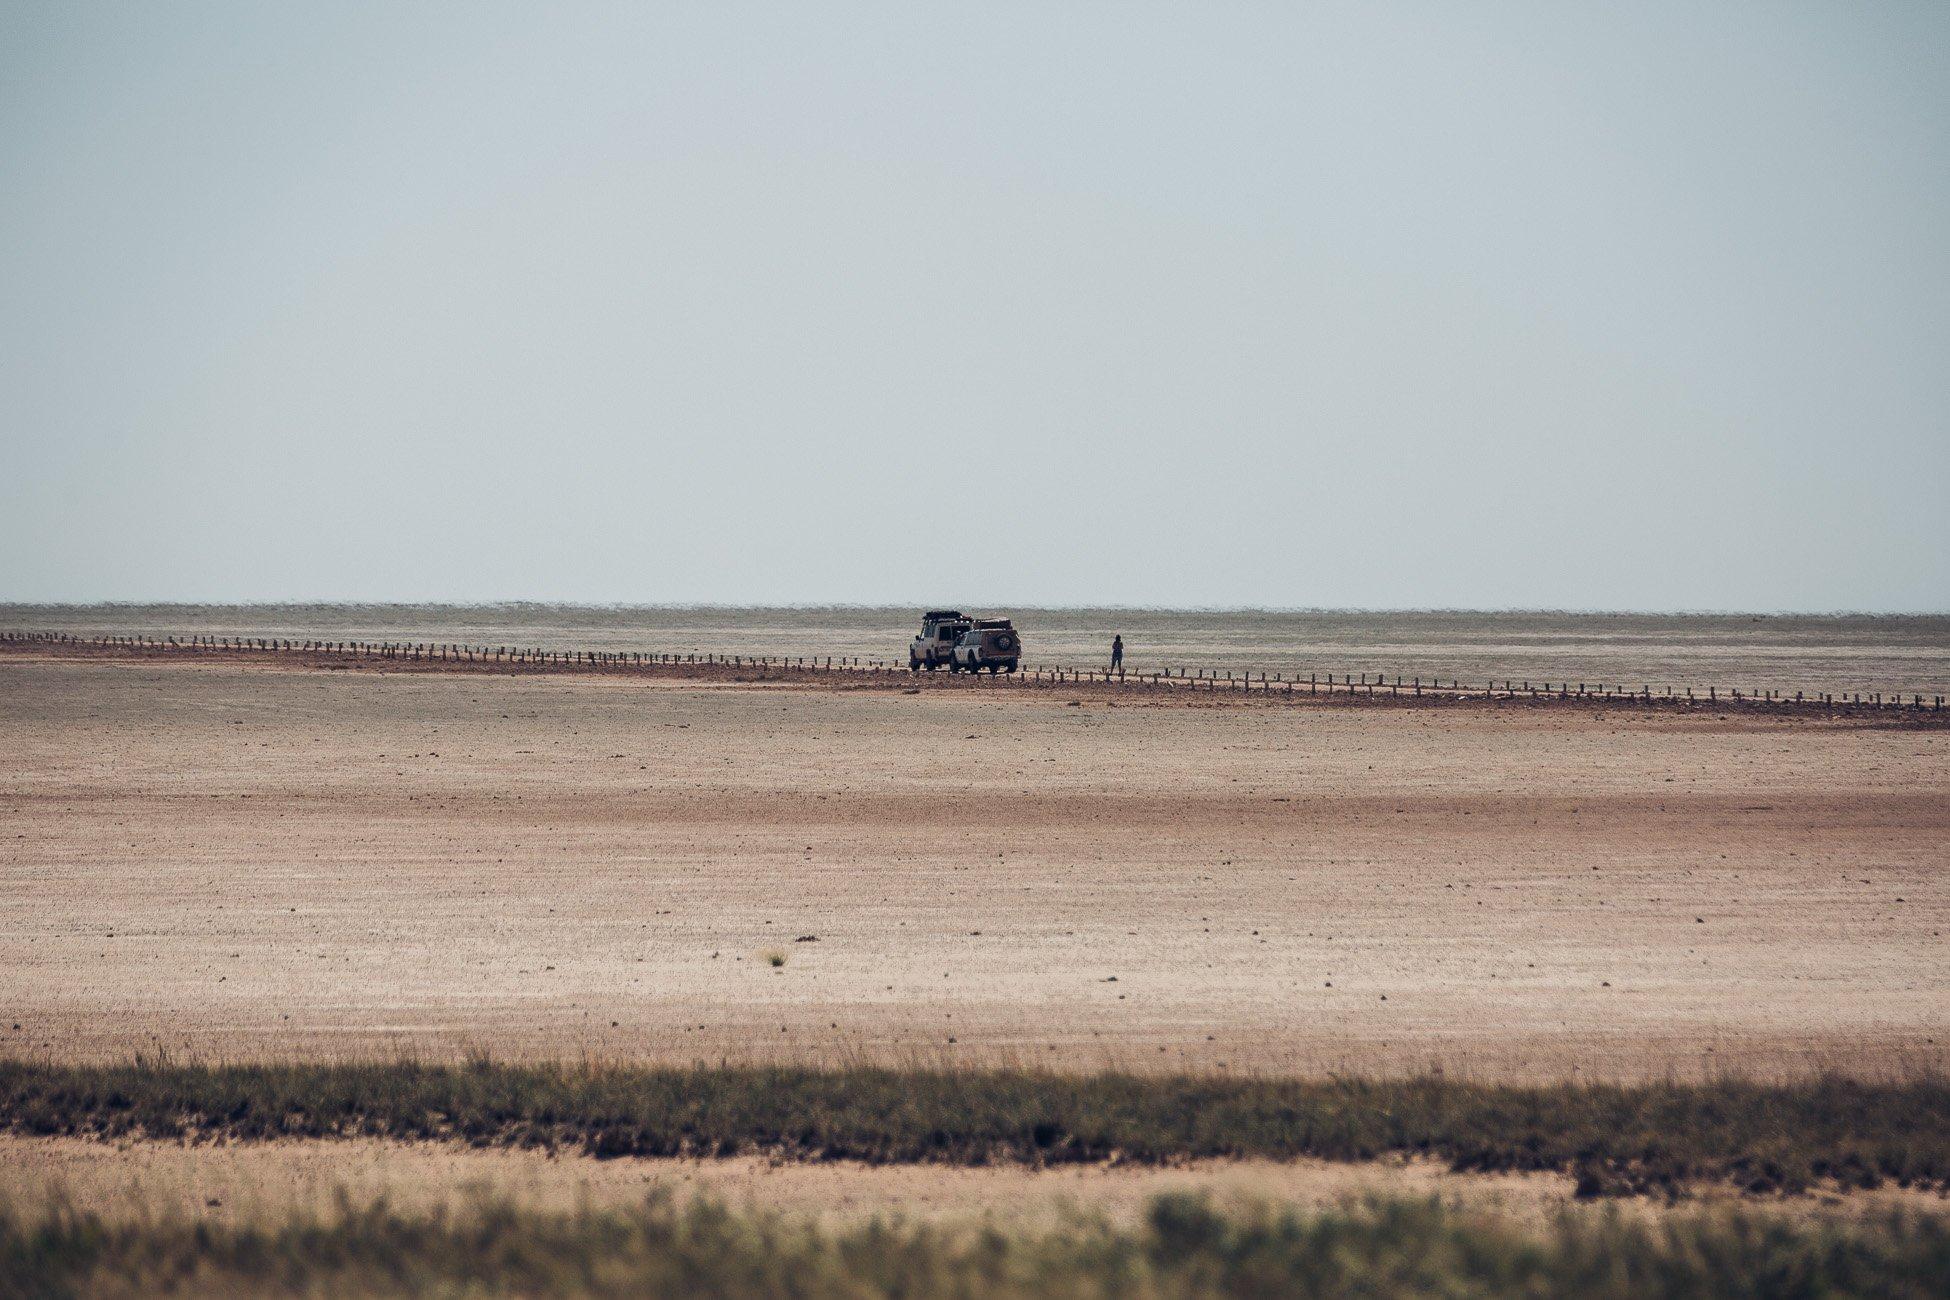 Self-driving safari at Etosha National Park